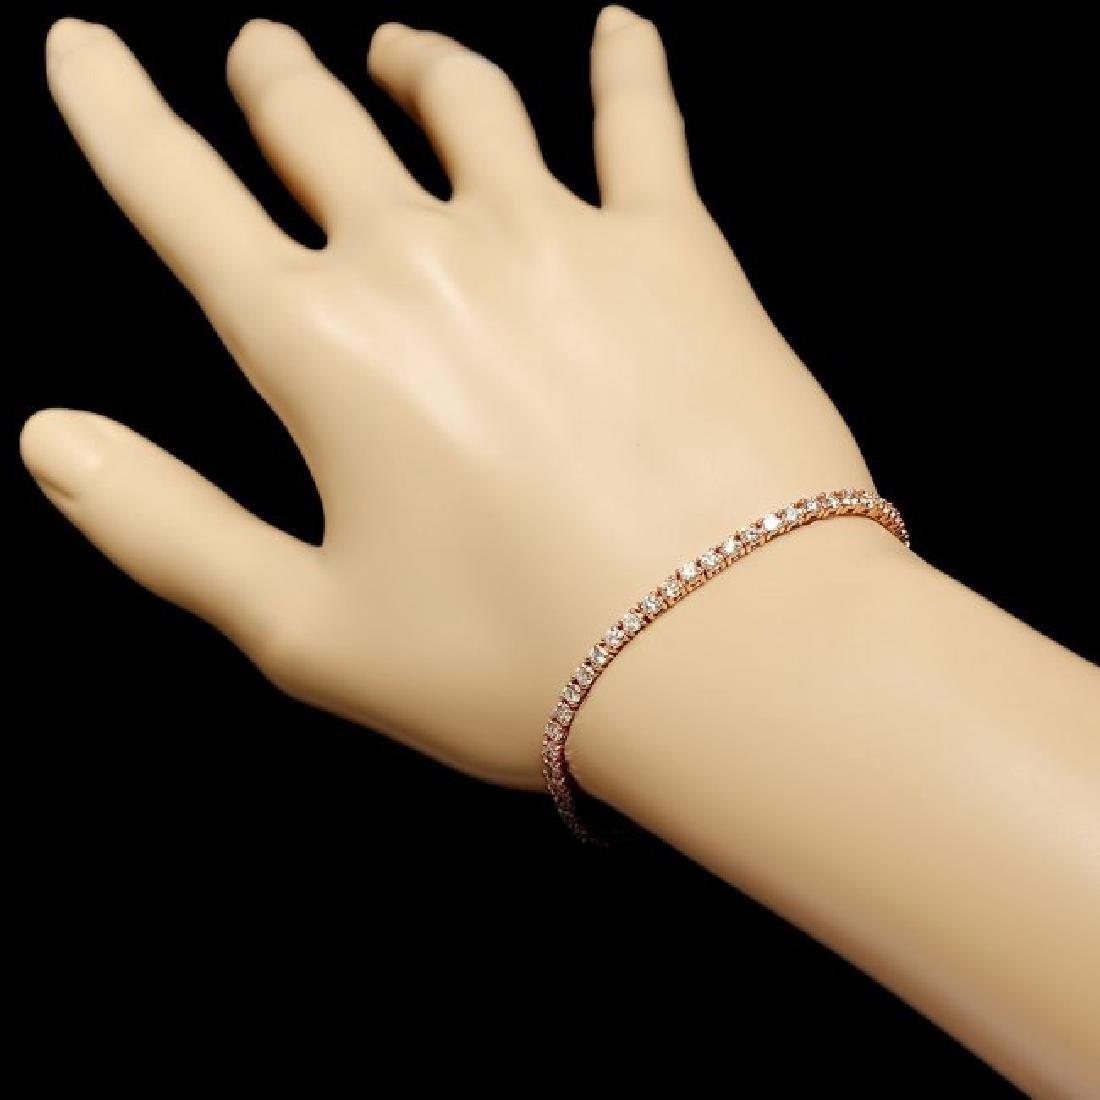 14k Rose Gold 3.60ct Diamond Bracelet - 4